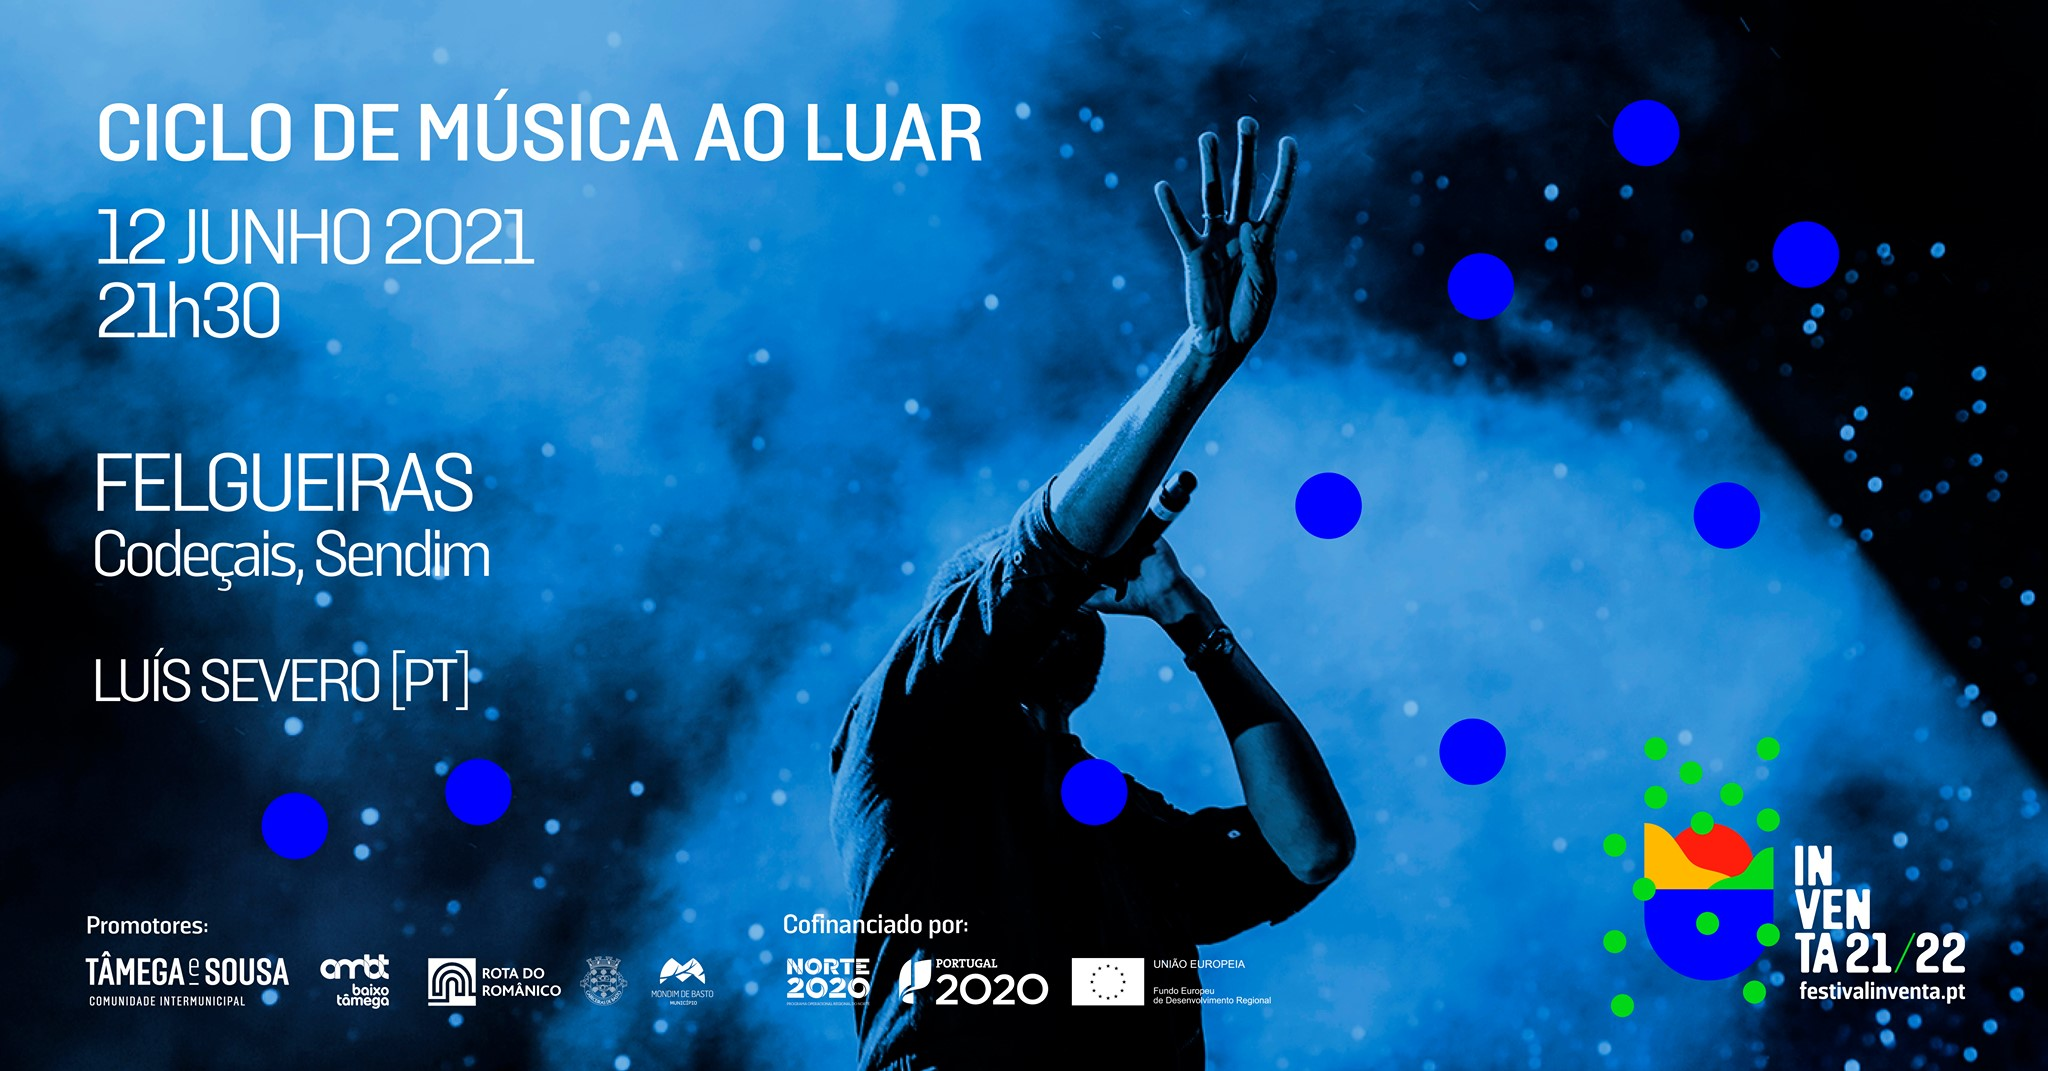 Luís Severo - Ciclo de música ao luar - Felgueiras